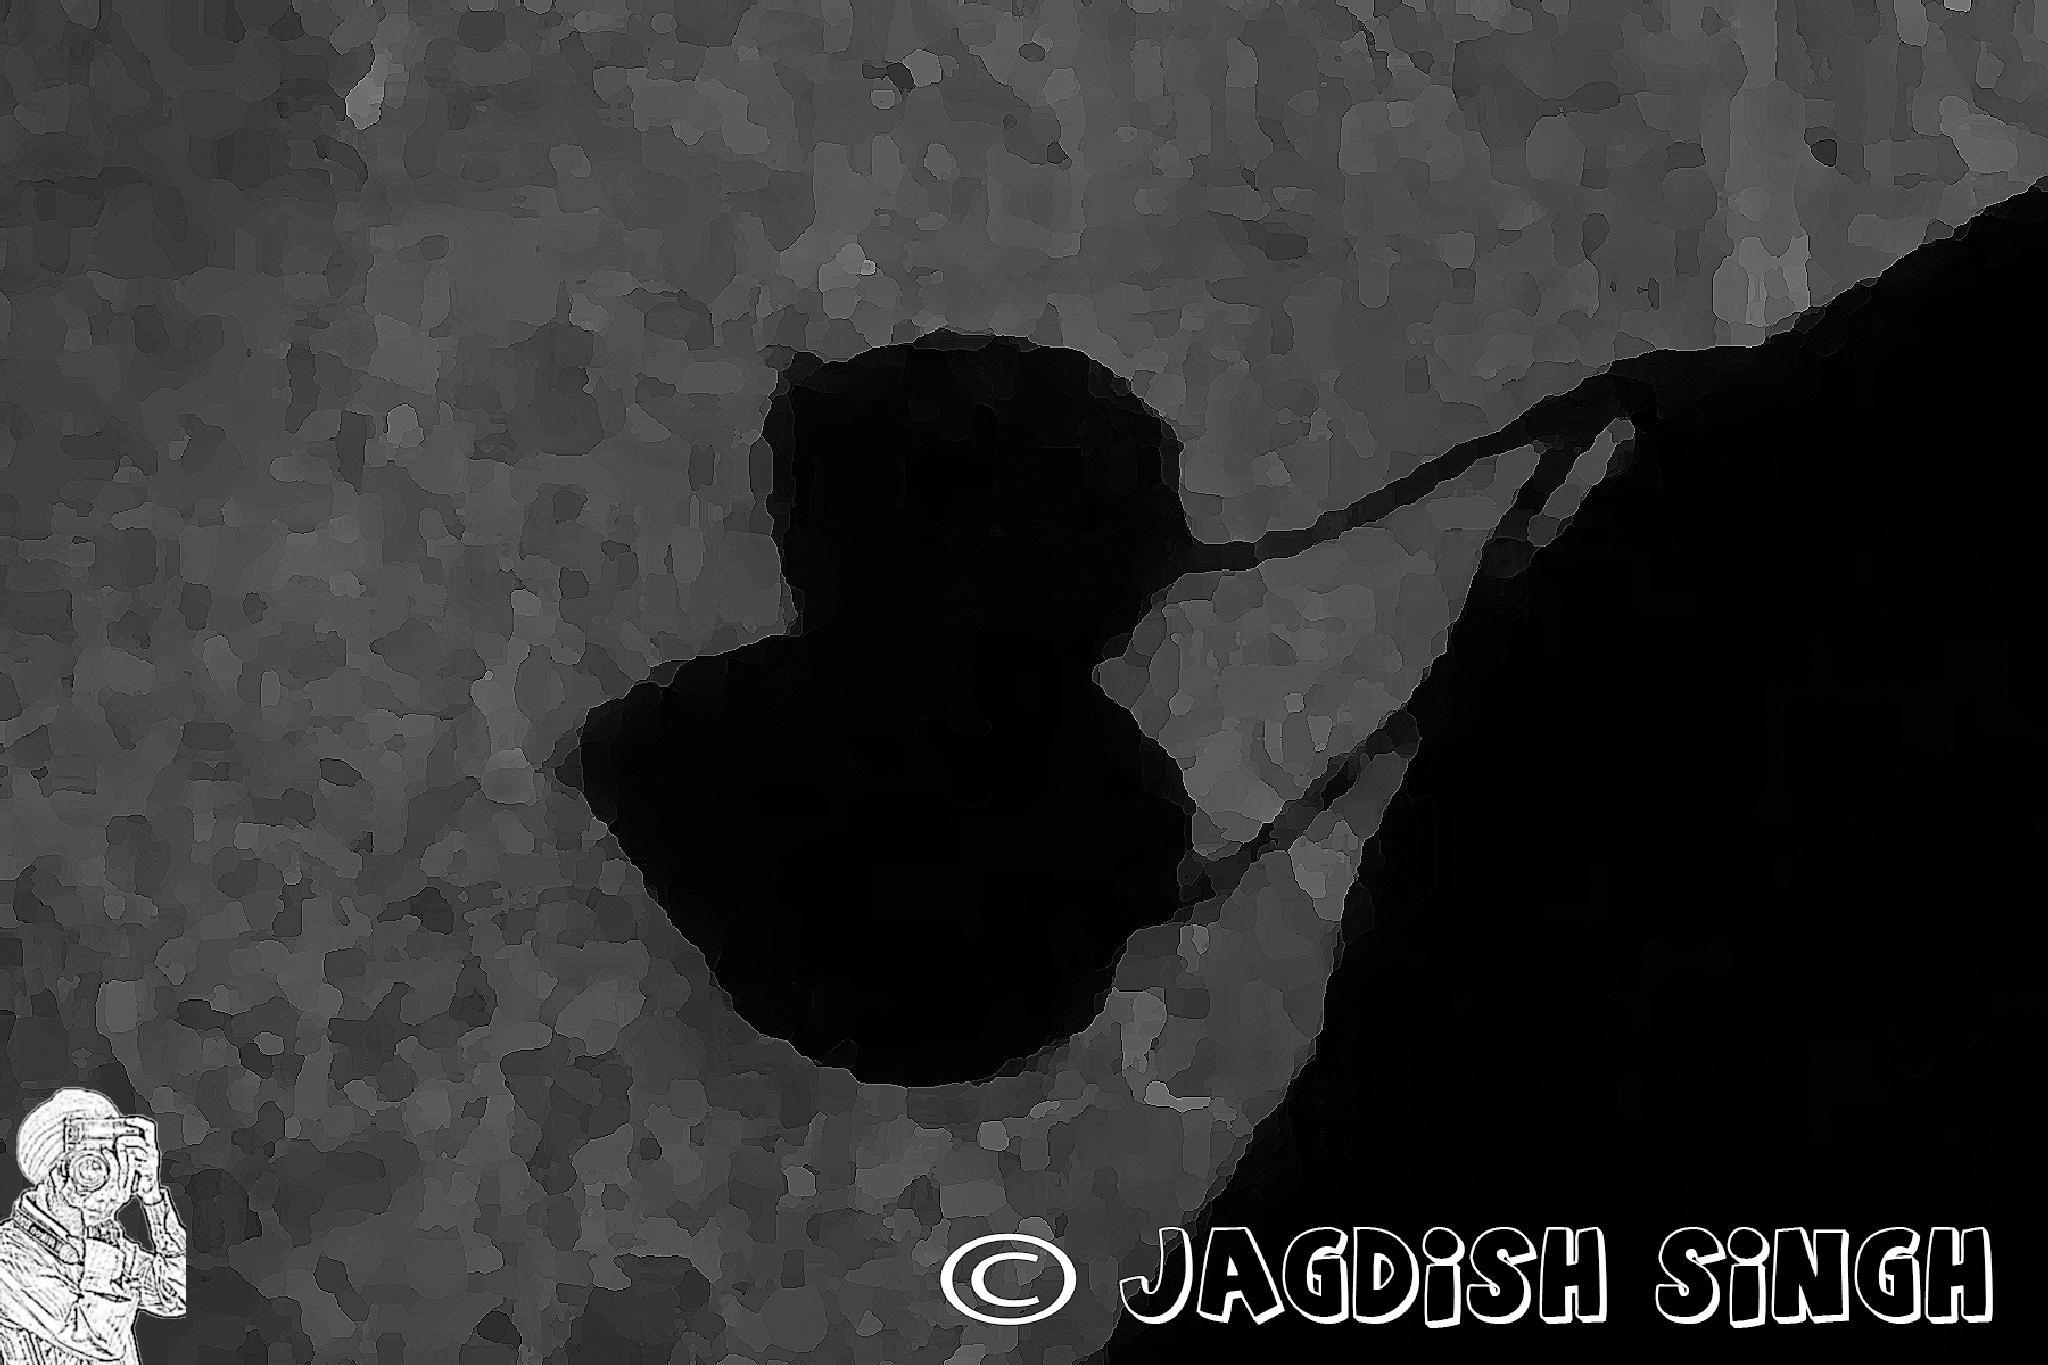 Jagdish - Dark Fantasy. by jagdishranchi